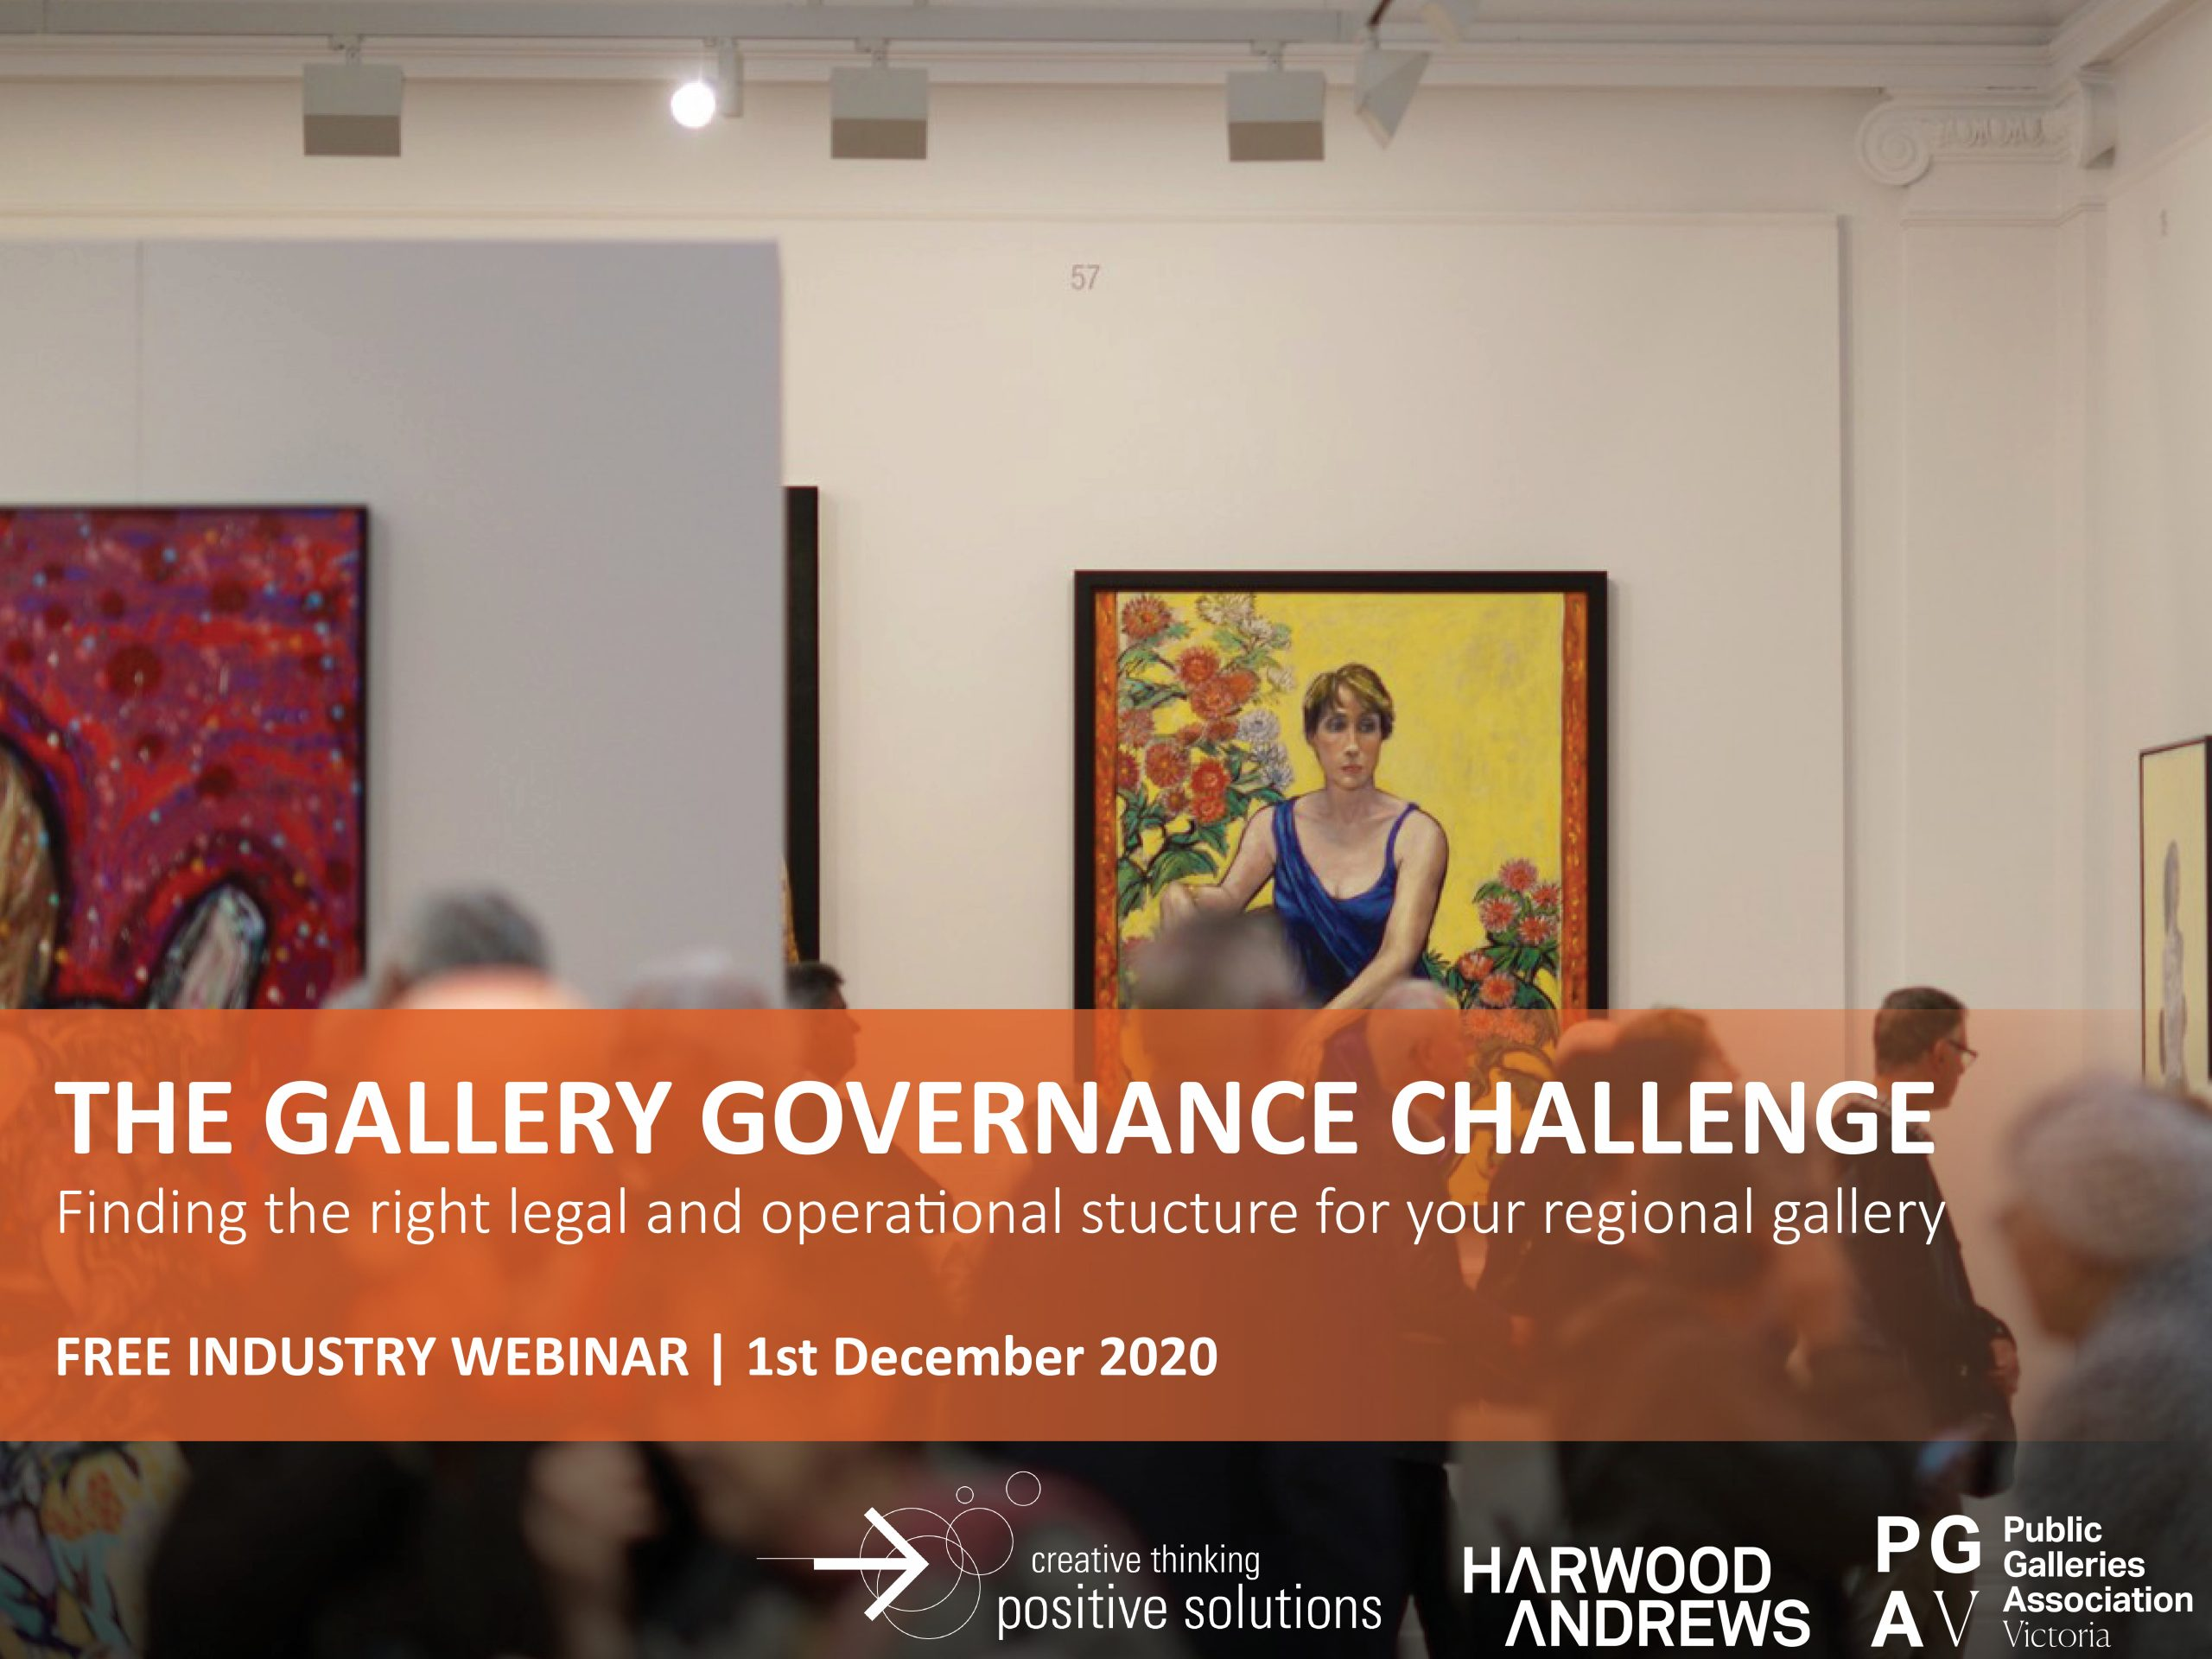 Gallery Governance Webinar